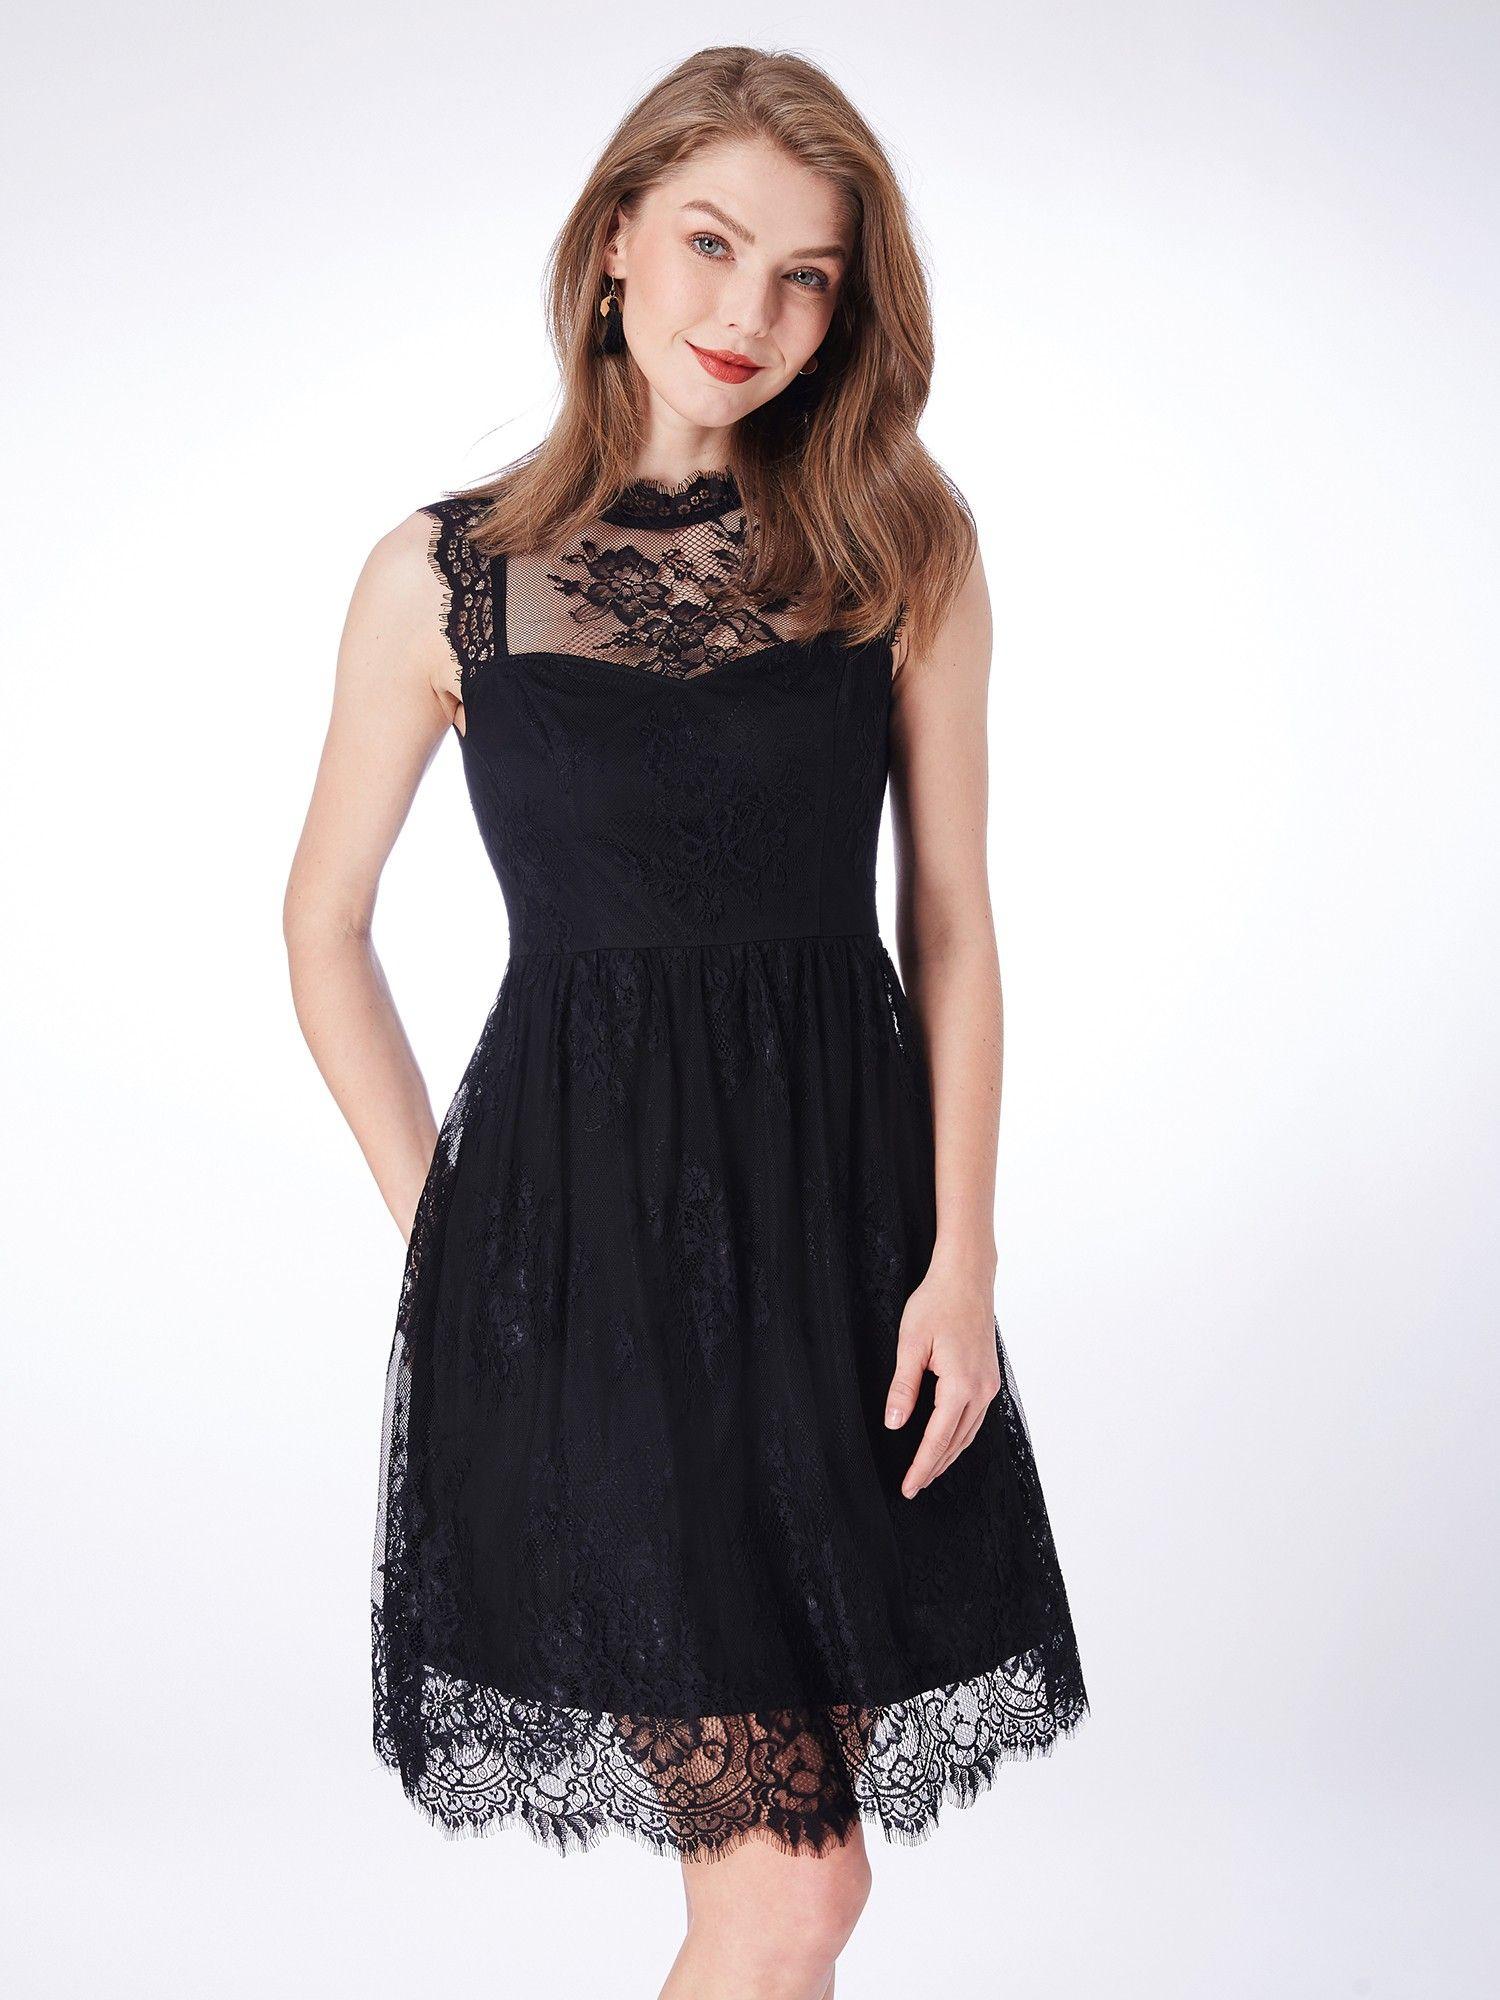 eeca20ed22f9 Alisa Pan Sleeveless Lacey Little Black Dress | Ever-Pretty #lacedress  #shortdress #partydress #EverPretty #blackdress #partydresses